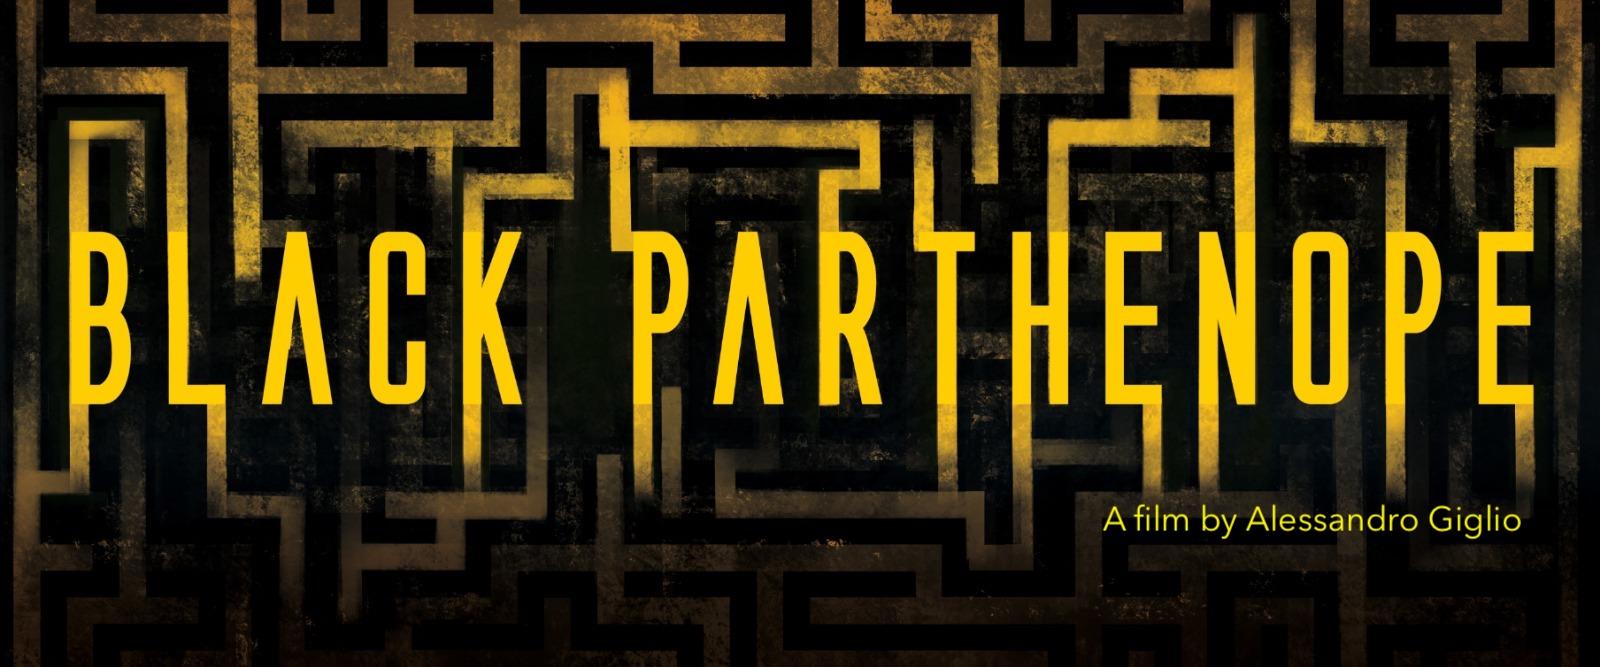 Black Parthenope